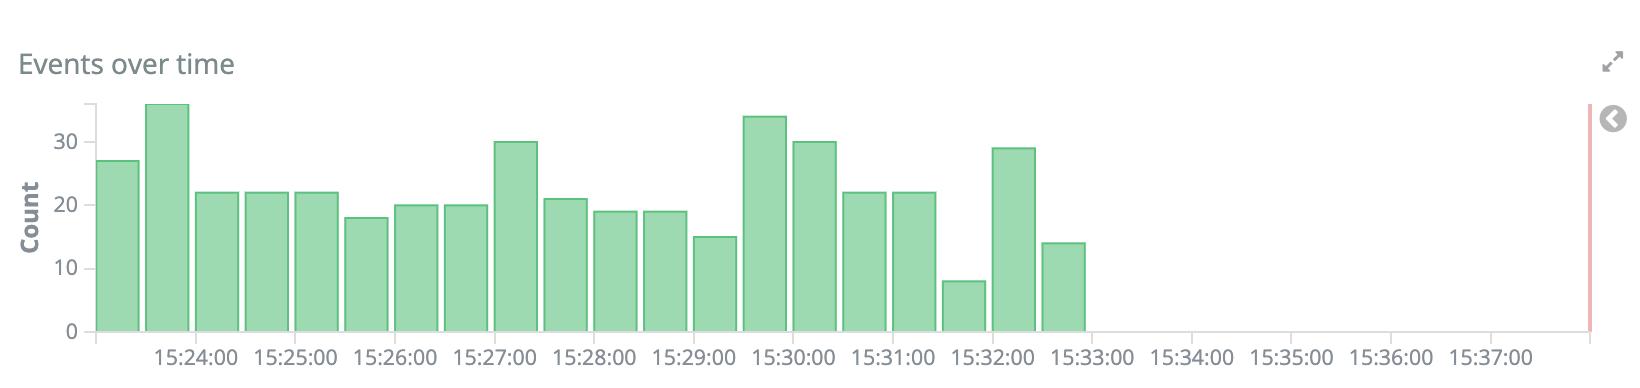 Screenshot 2020-02-27 at 15.38.19.png (388×1 px, 50 KB)